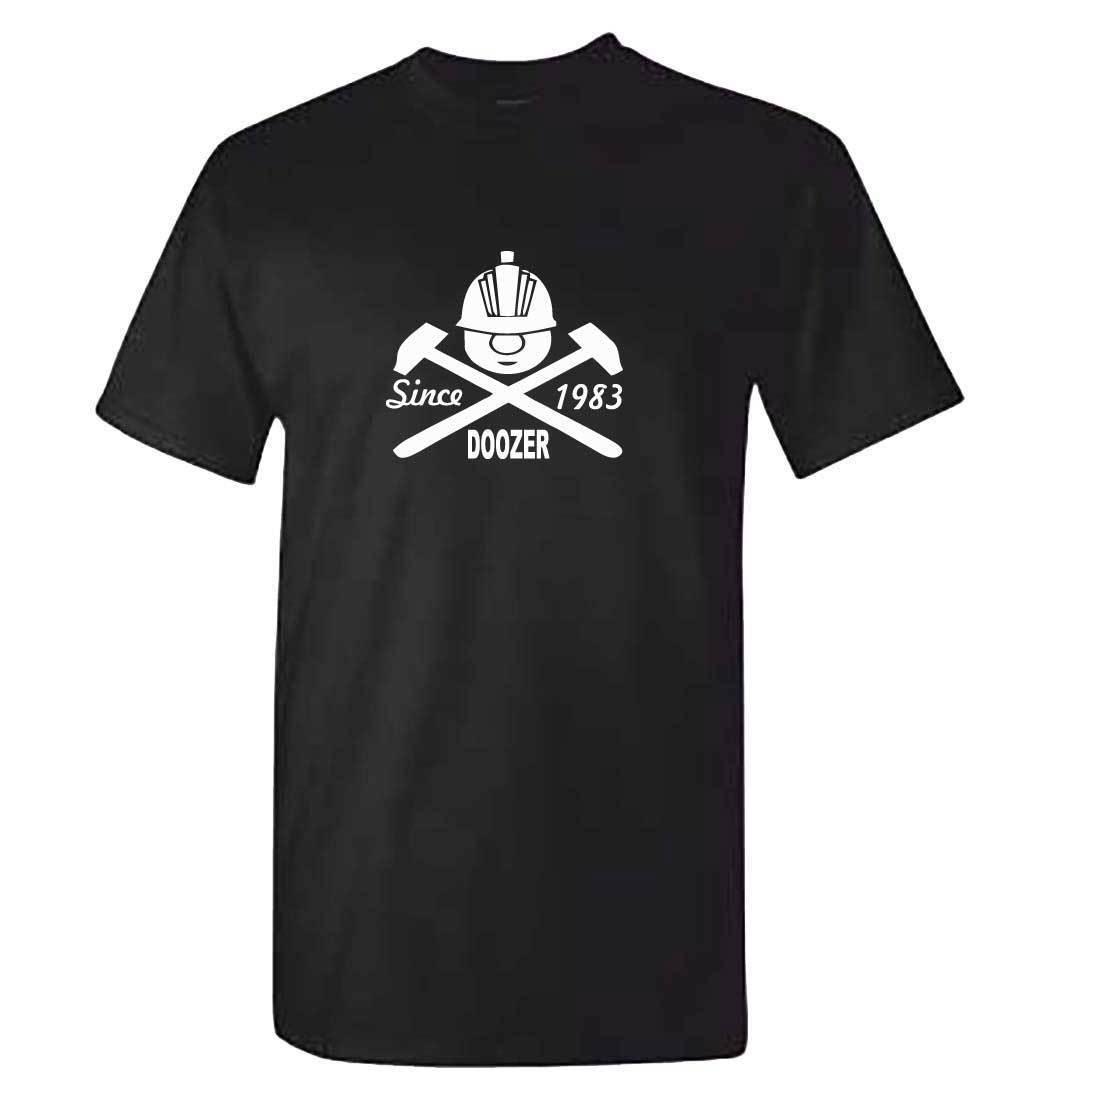 Mens Black Fraggle Rock TShirt - Retro 80s Childrens Cartoon Doozer Since 1983 Cool Casual pride t shirt men Unisex New Fashion